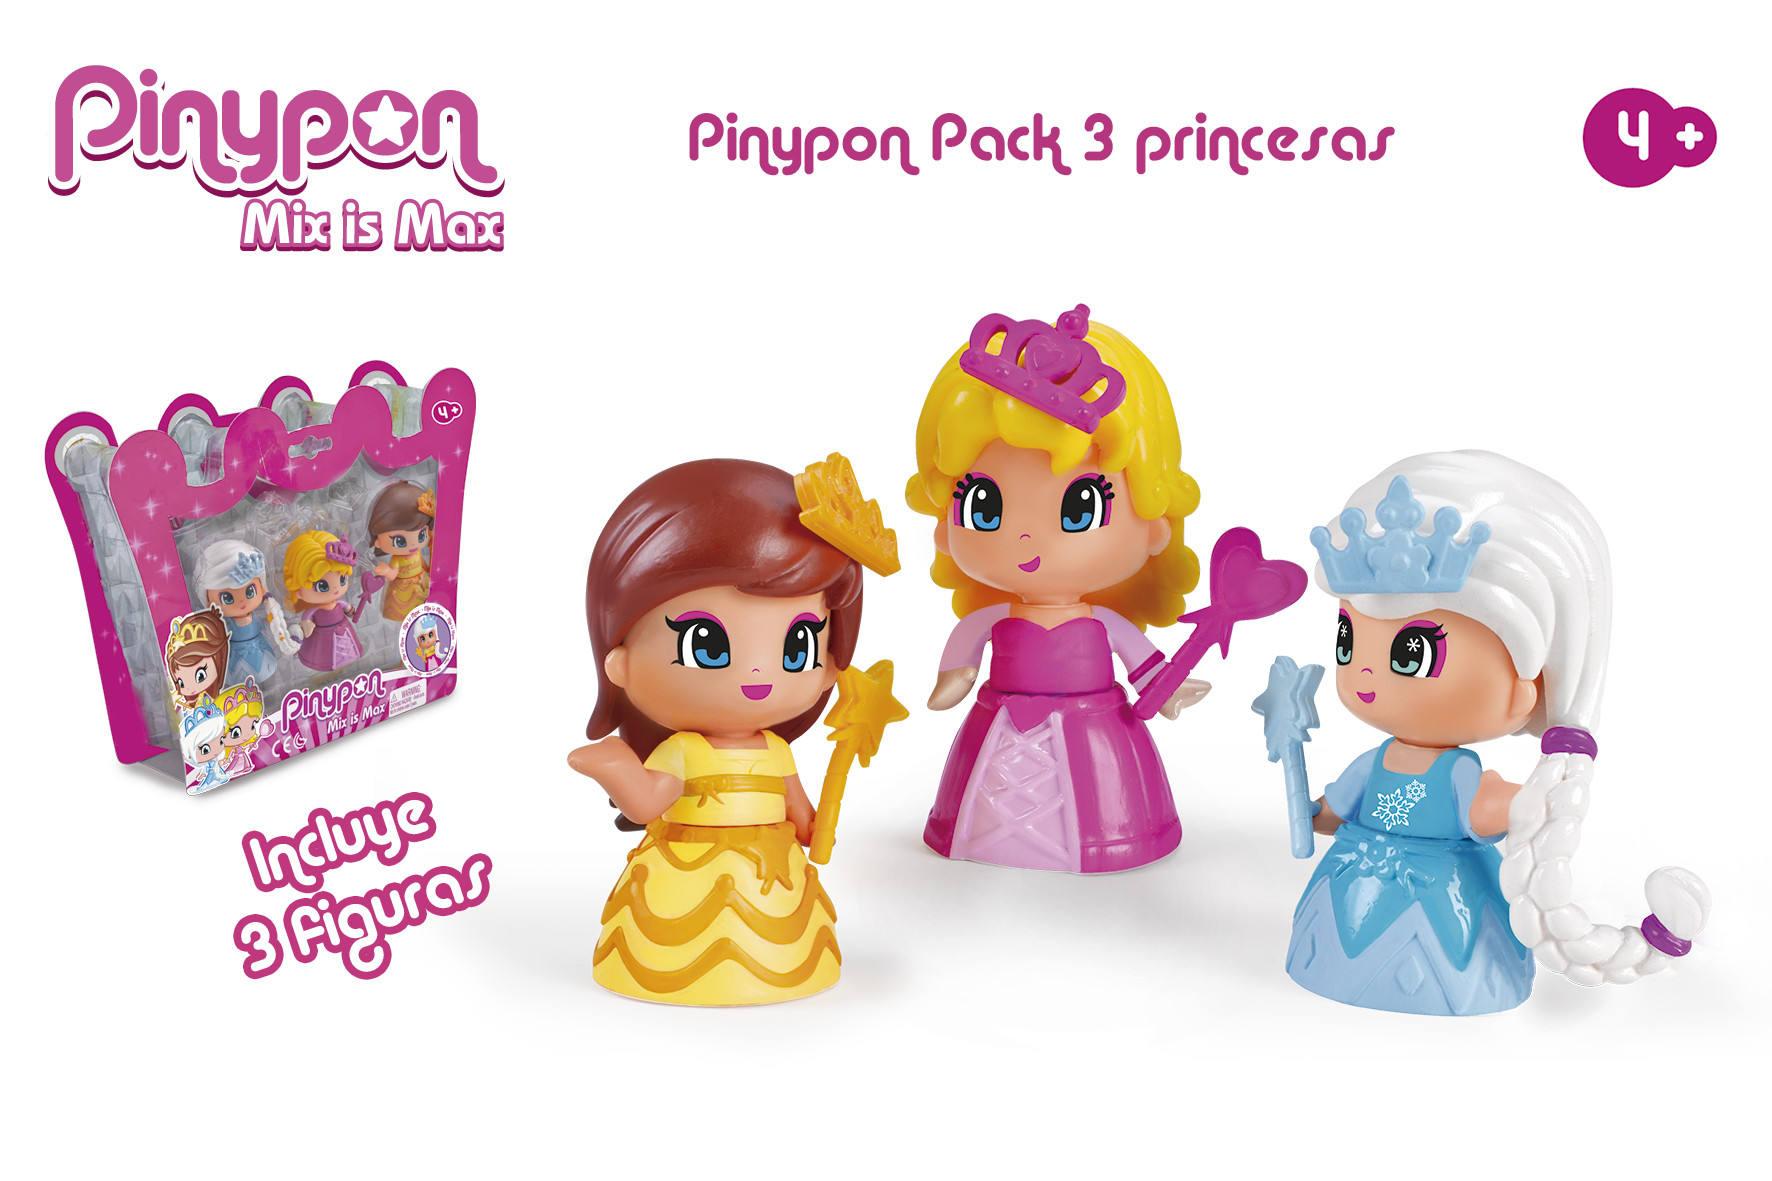 PINYPON PACK 3 PRINCESAS 14094